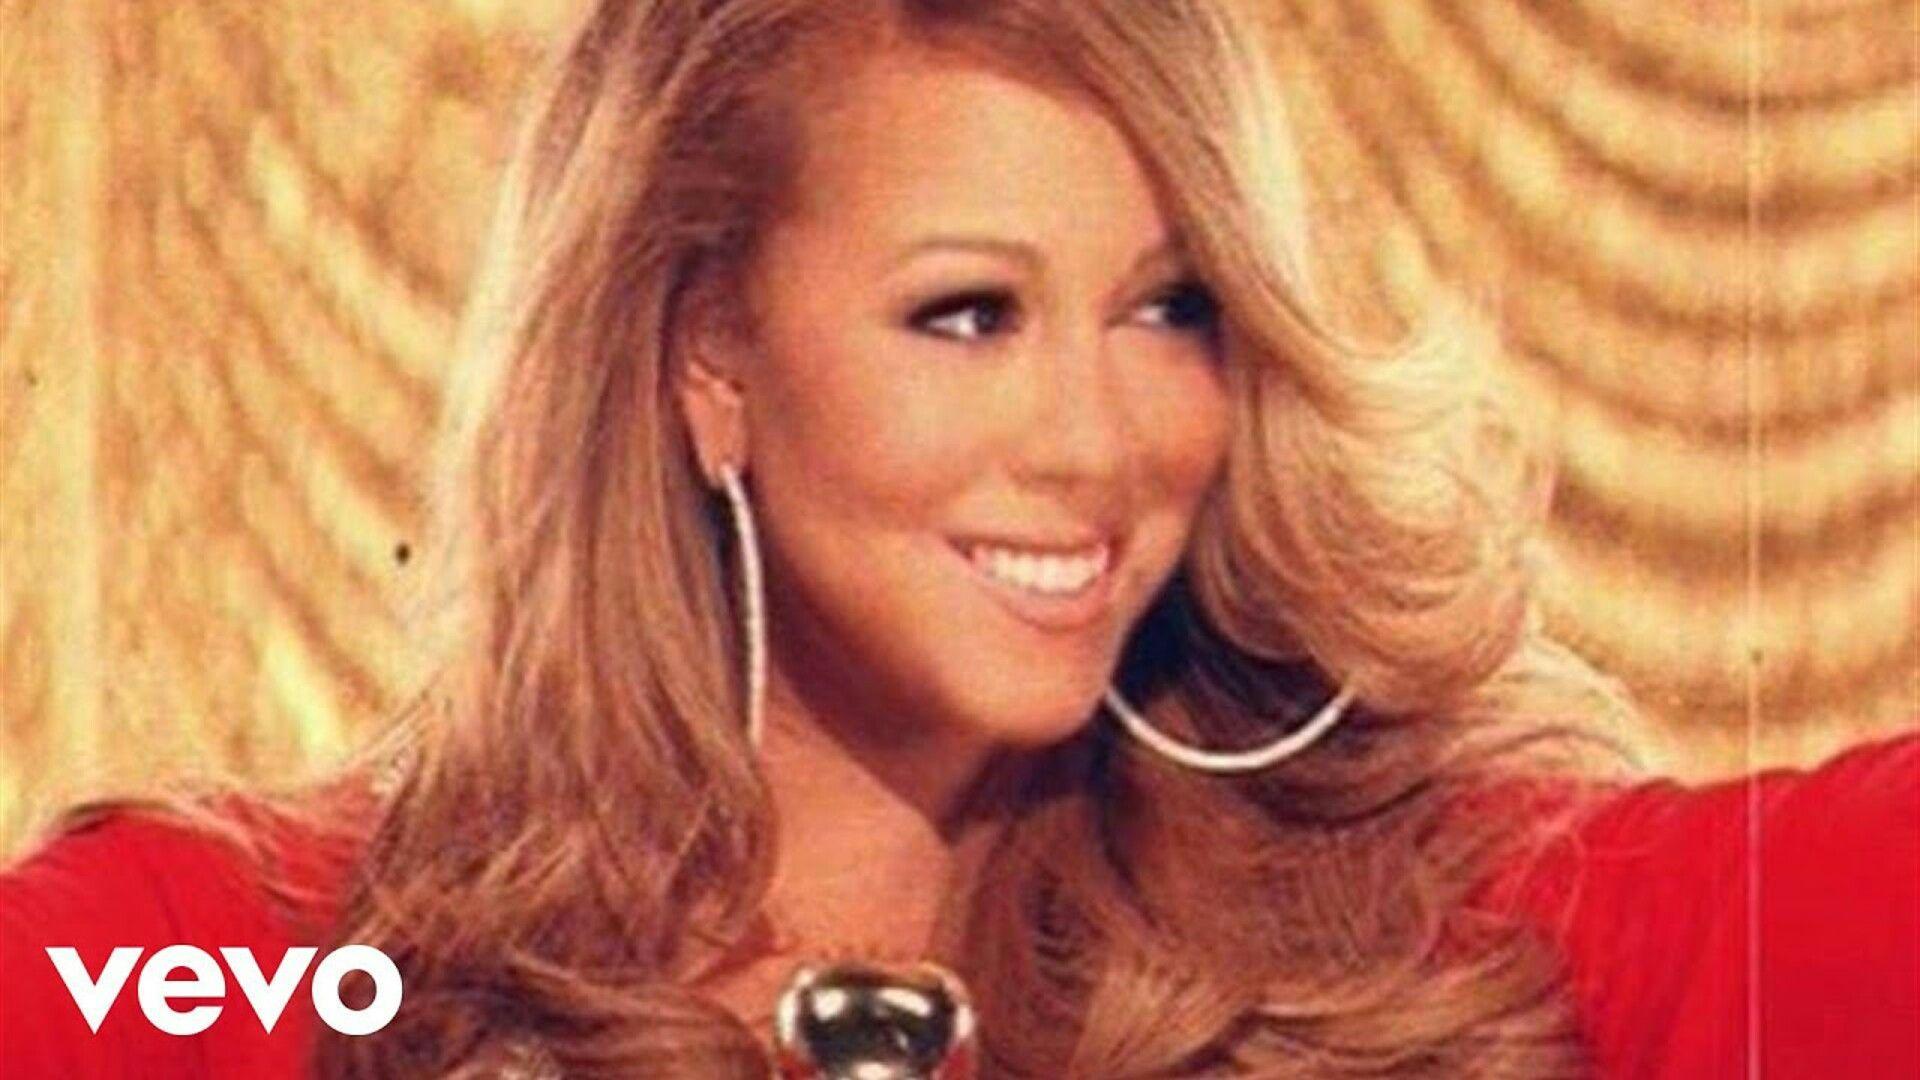 Pin by Utopian Scott2 Hoffmann on Mariah Carey Videos Pixz ...